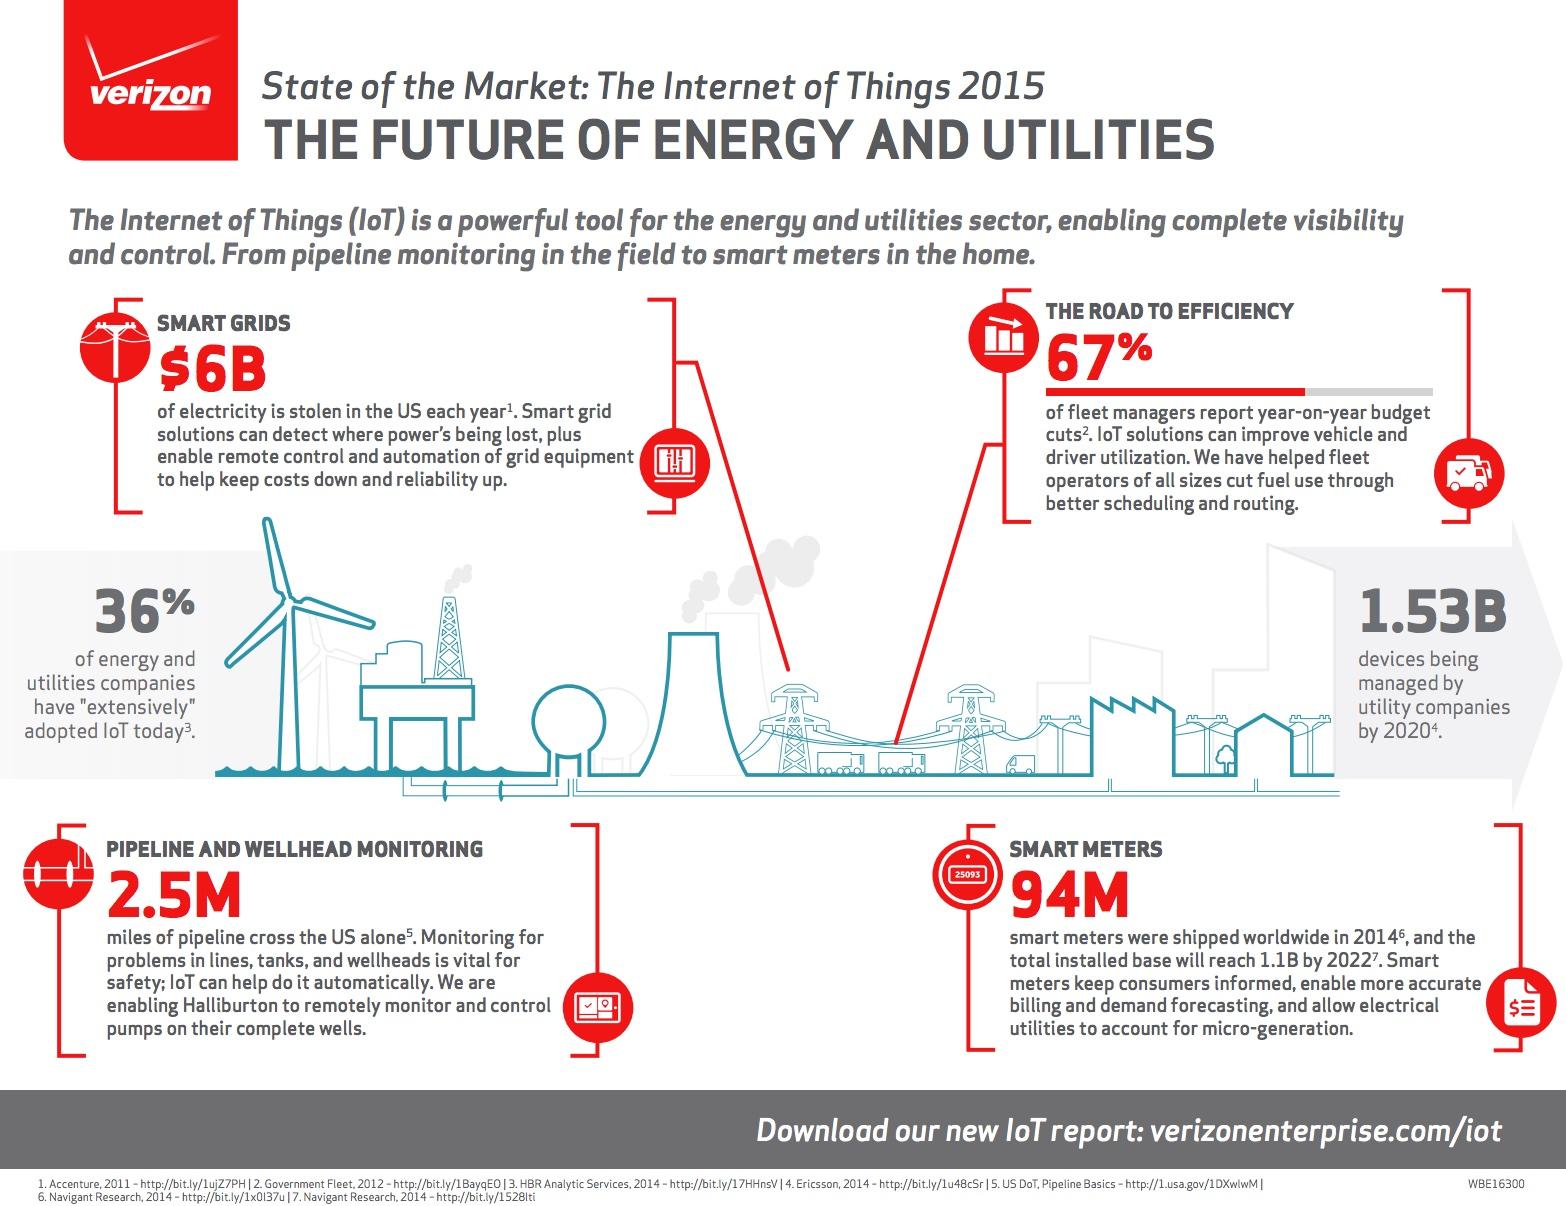 www_verizonenterprise_com_resources_infographic_ig_the-future-of-energy_en_xg_pdf